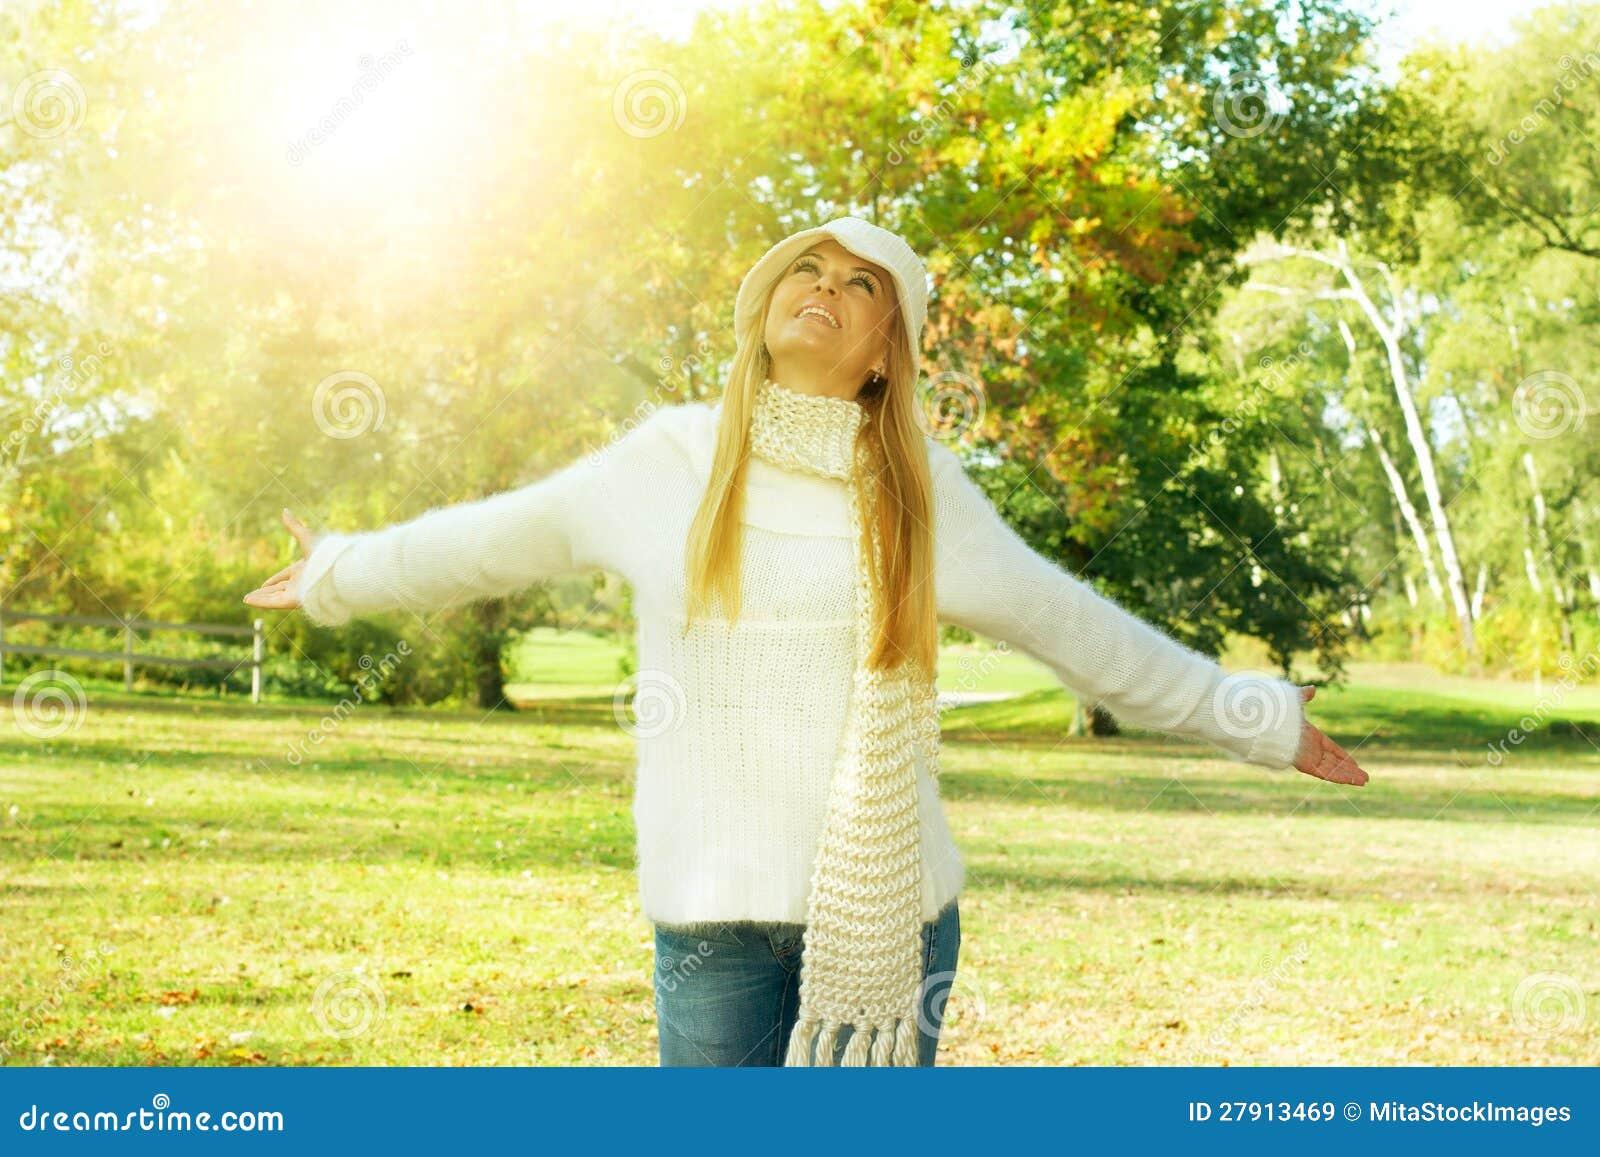 Natureza do enjoment da menina da felicidade